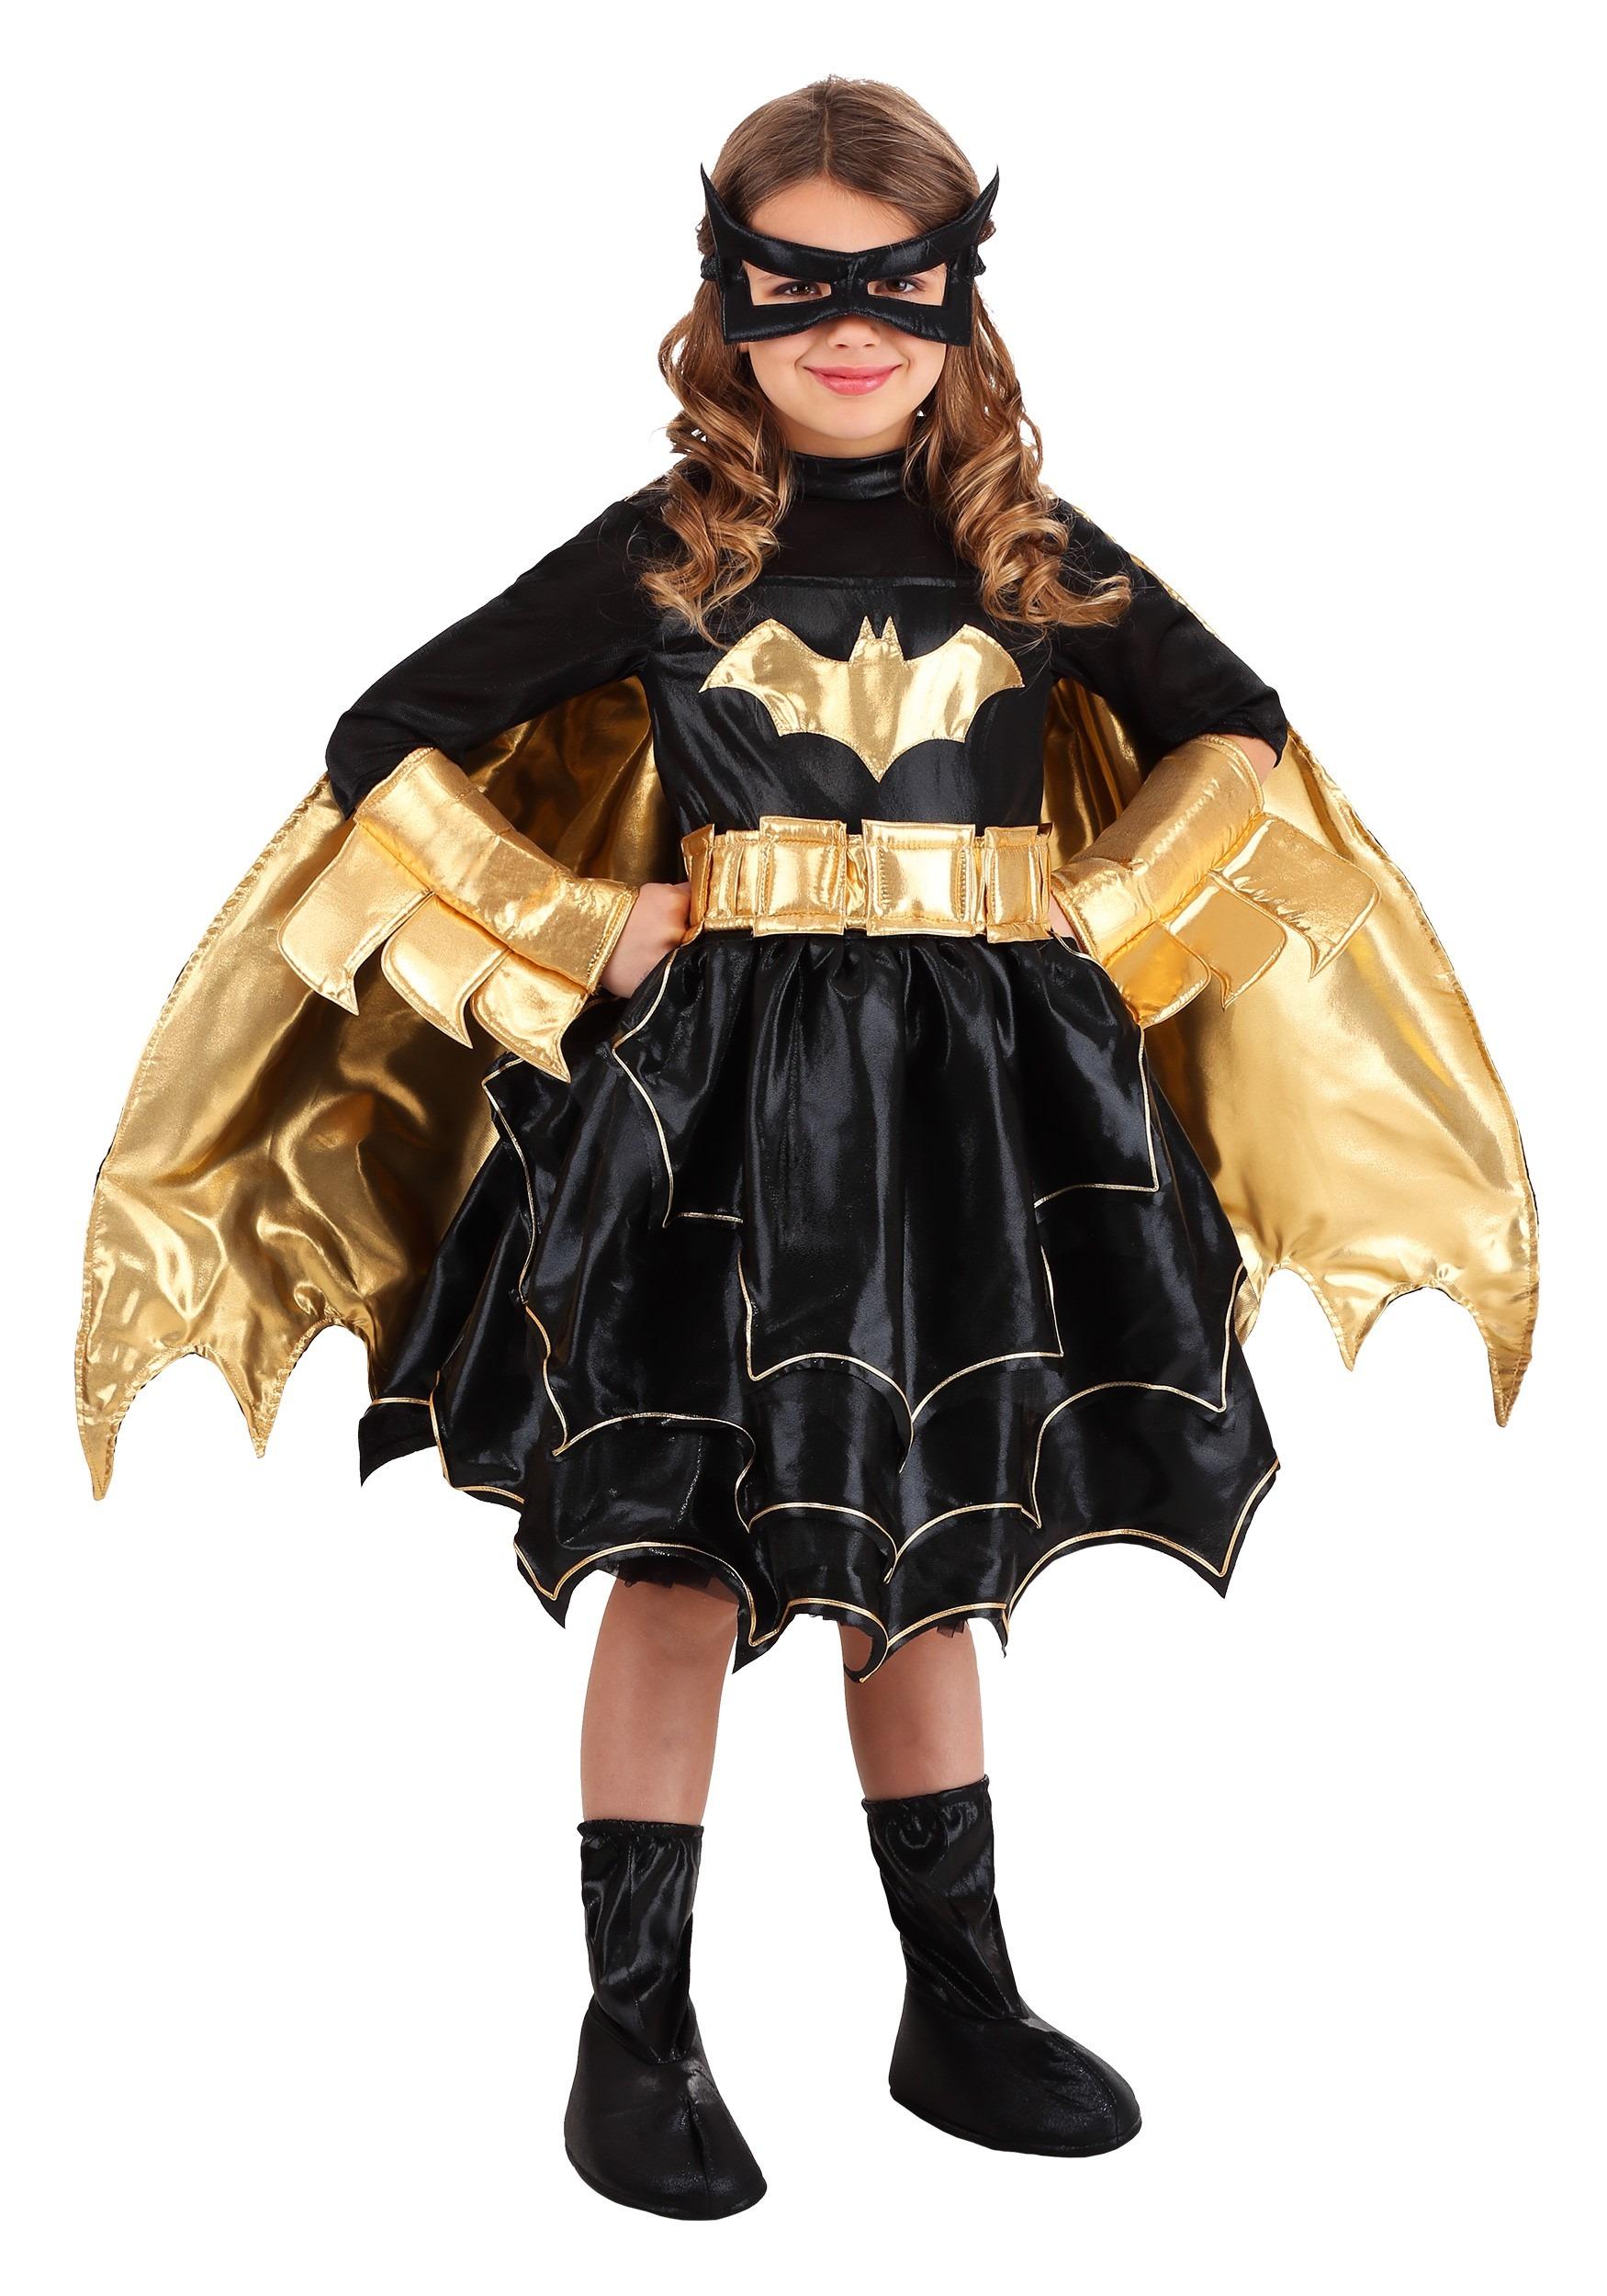 Deluxe DC Comics Batgirl Costume for GirlsBatgirl Costumes